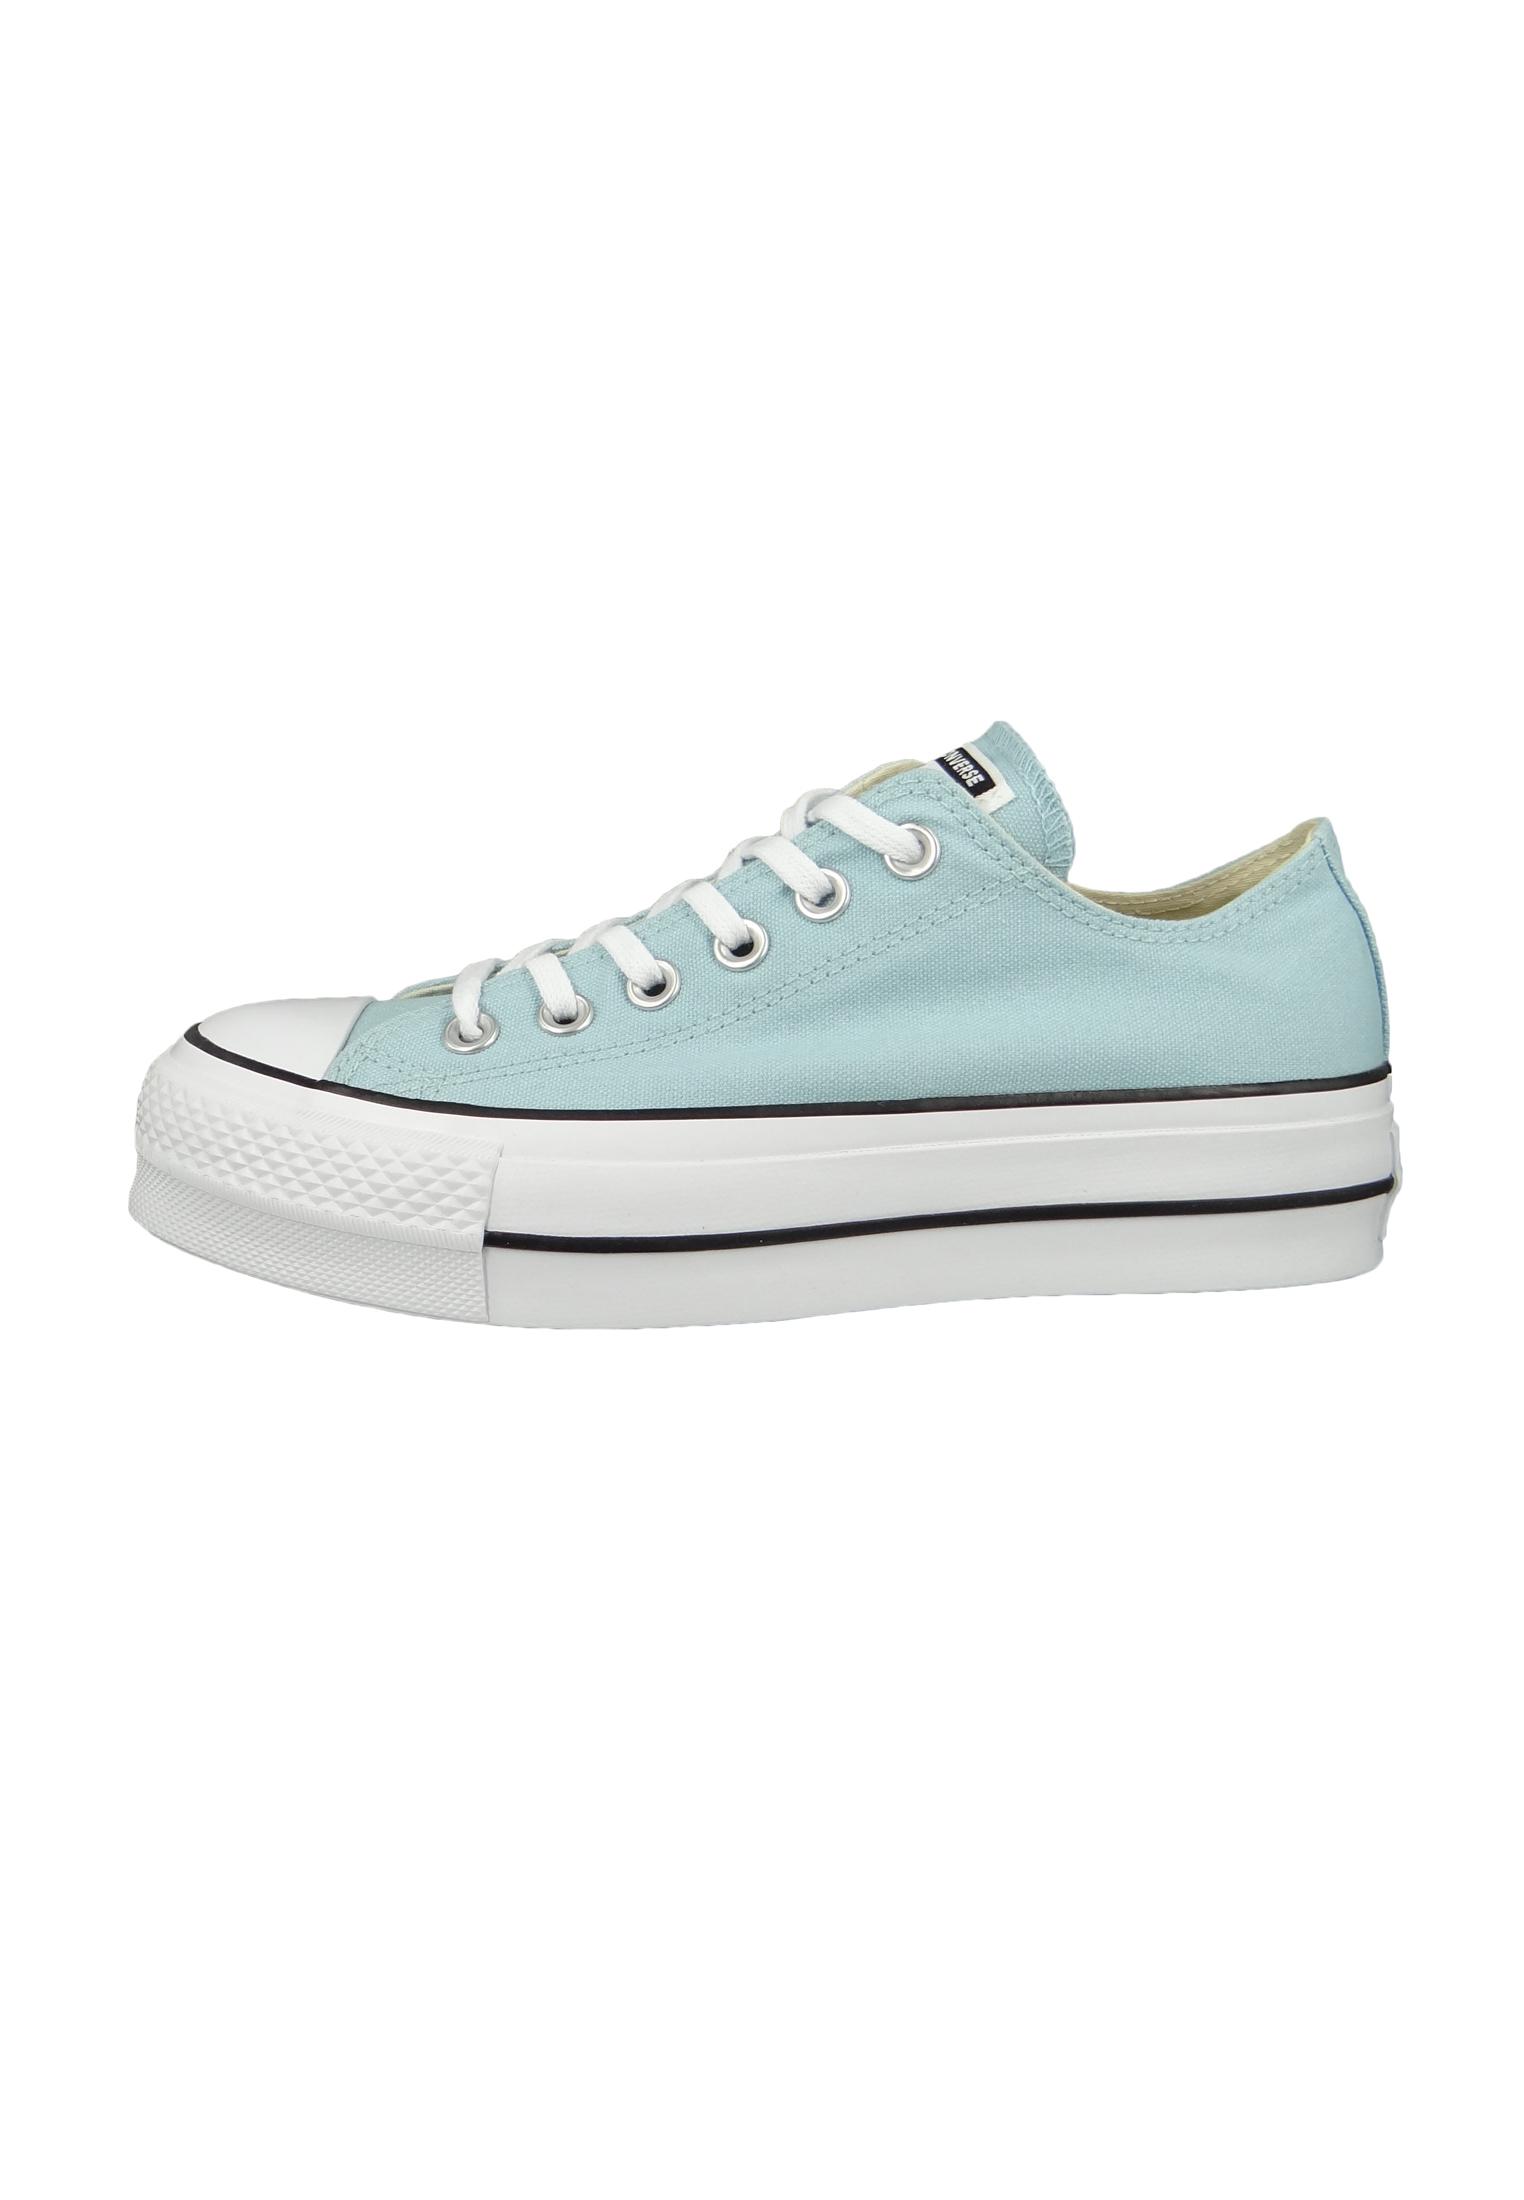 converse chucks blau 560687c chuck taylor all star lift ox ocean bliss white damenschuhe sneaker. Black Bedroom Furniture Sets. Home Design Ideas